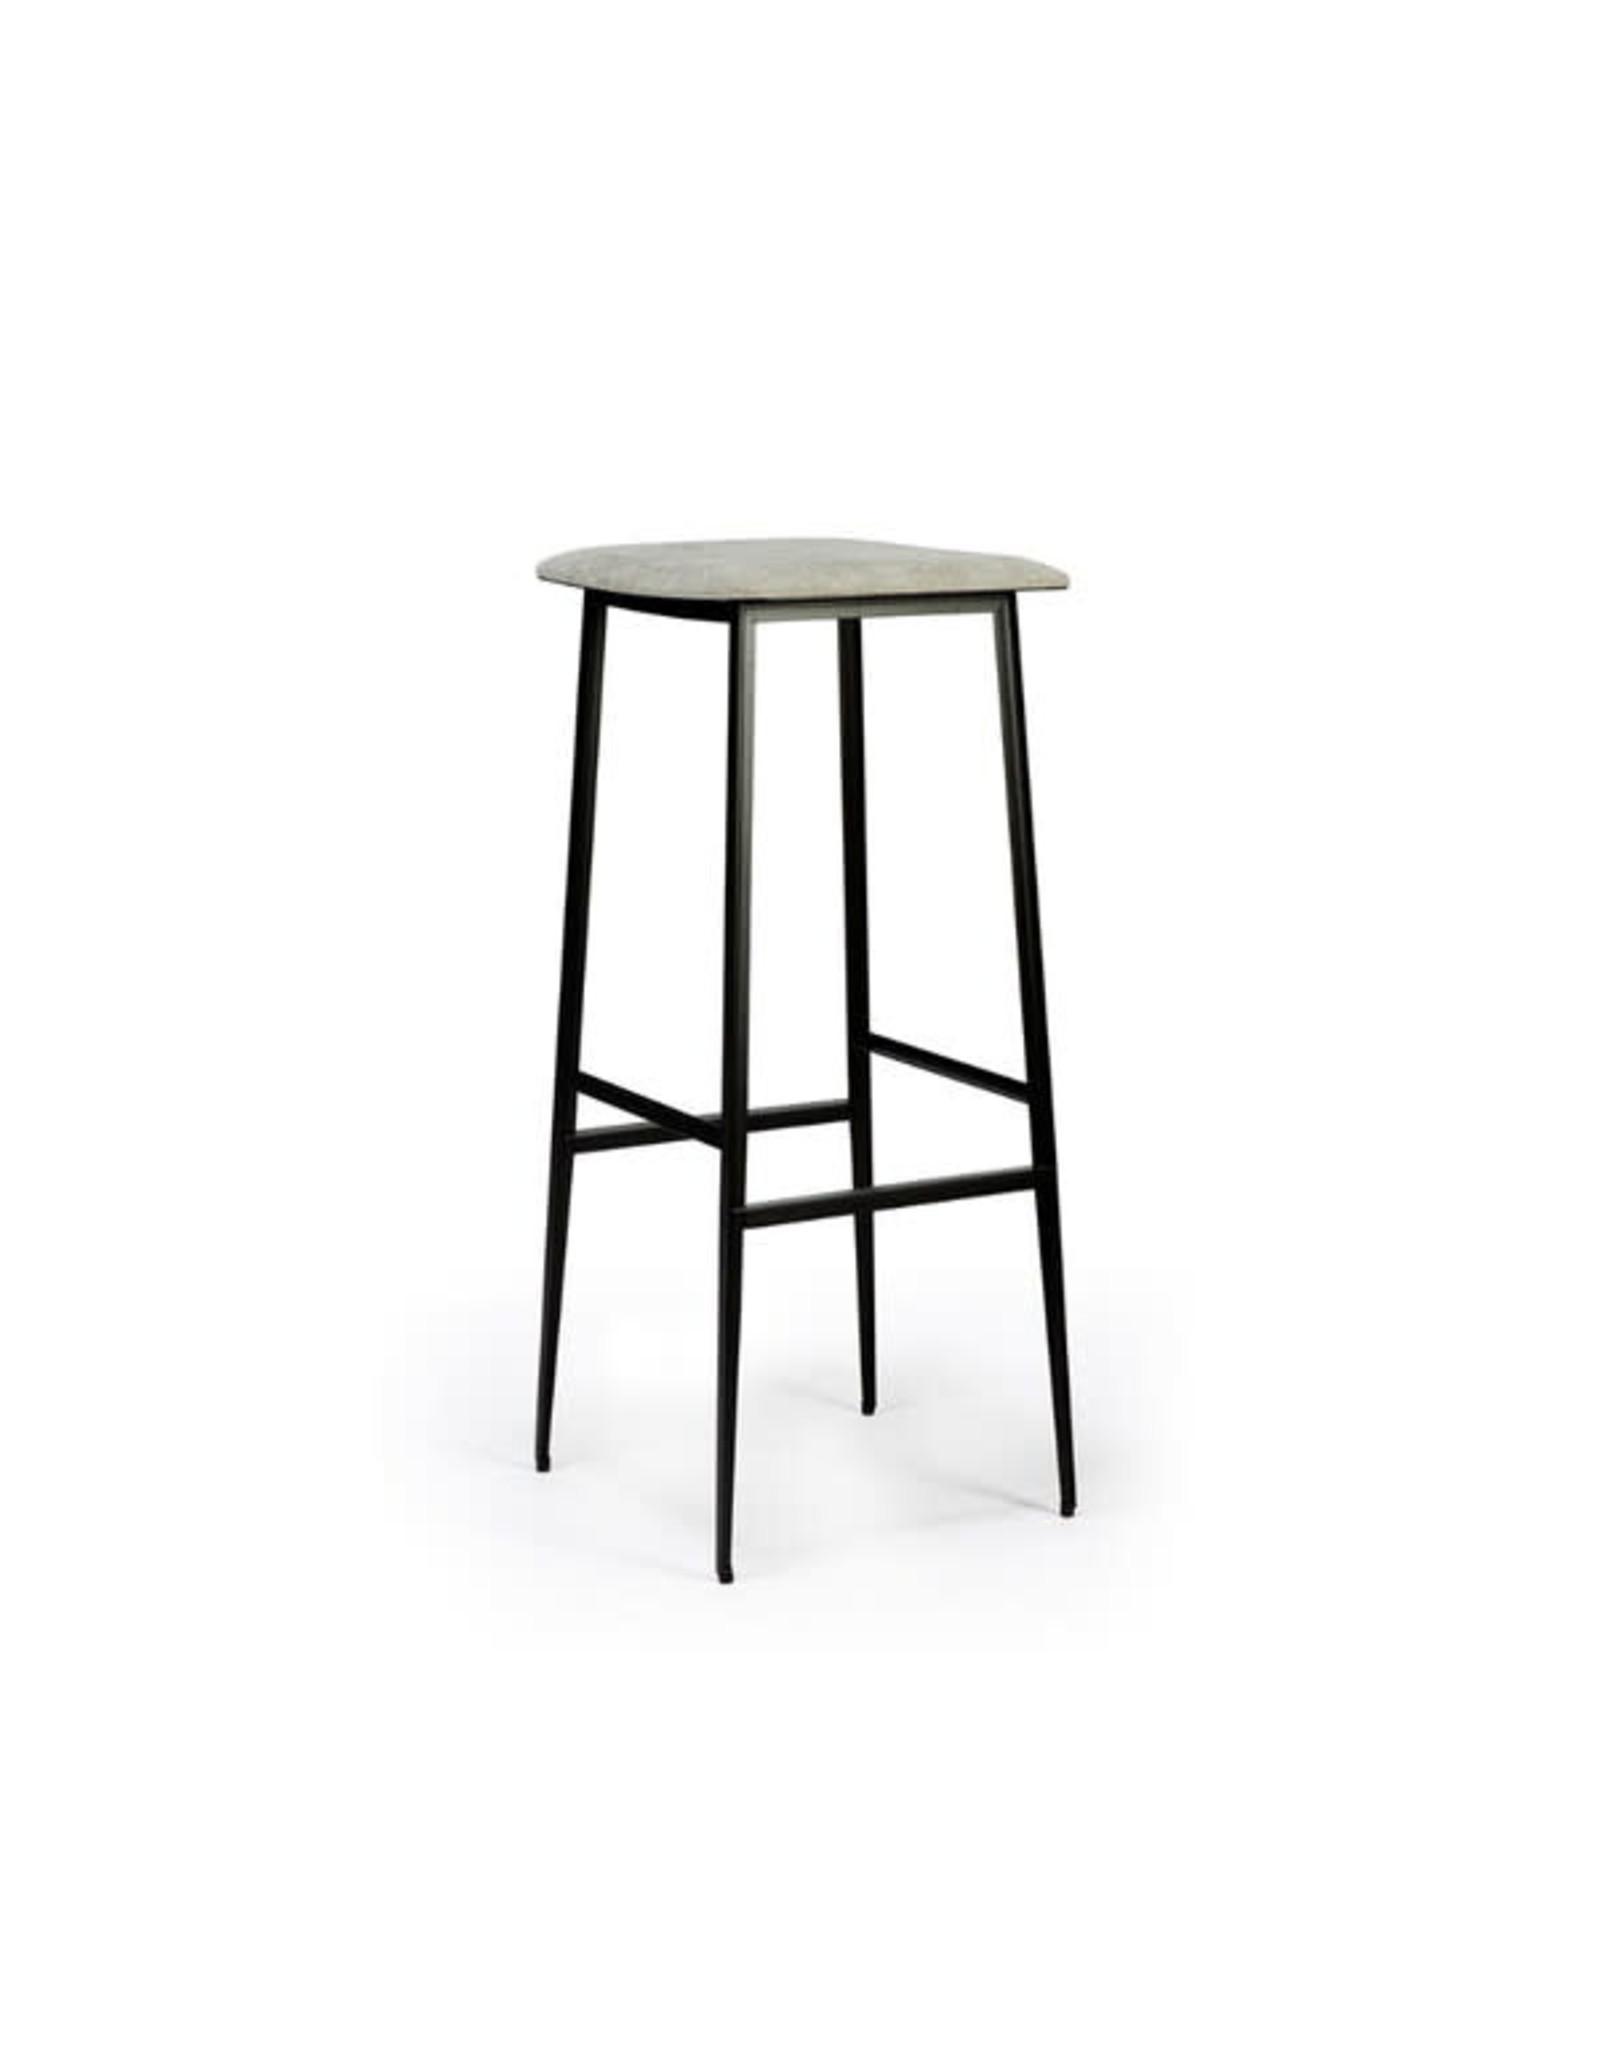 Ethnicraft DC bar stool (without backrest) - light grey